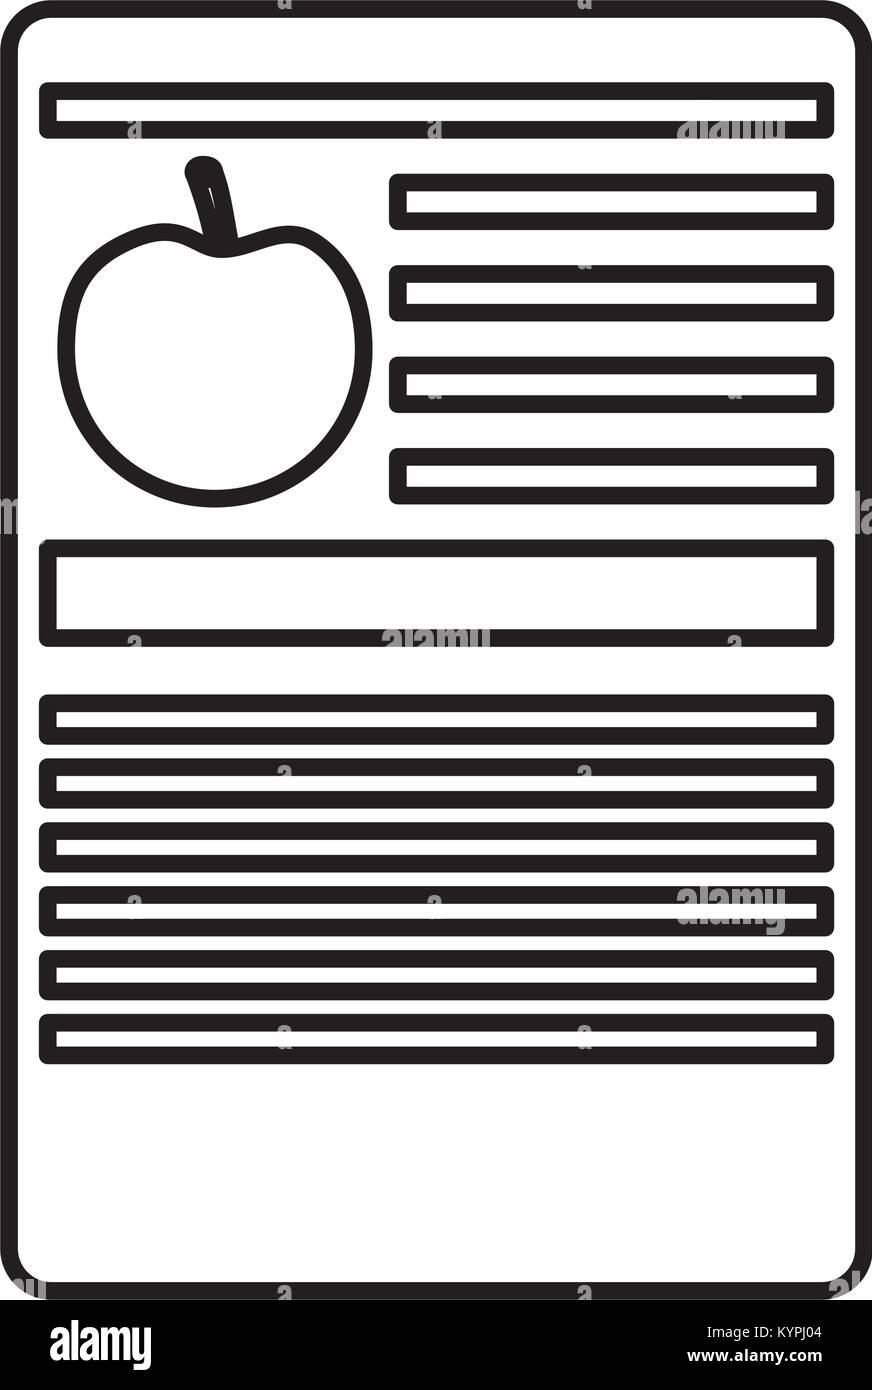 Charmant Versand Etikettenvorlage Frei Fotos - Entry Level Resume ...